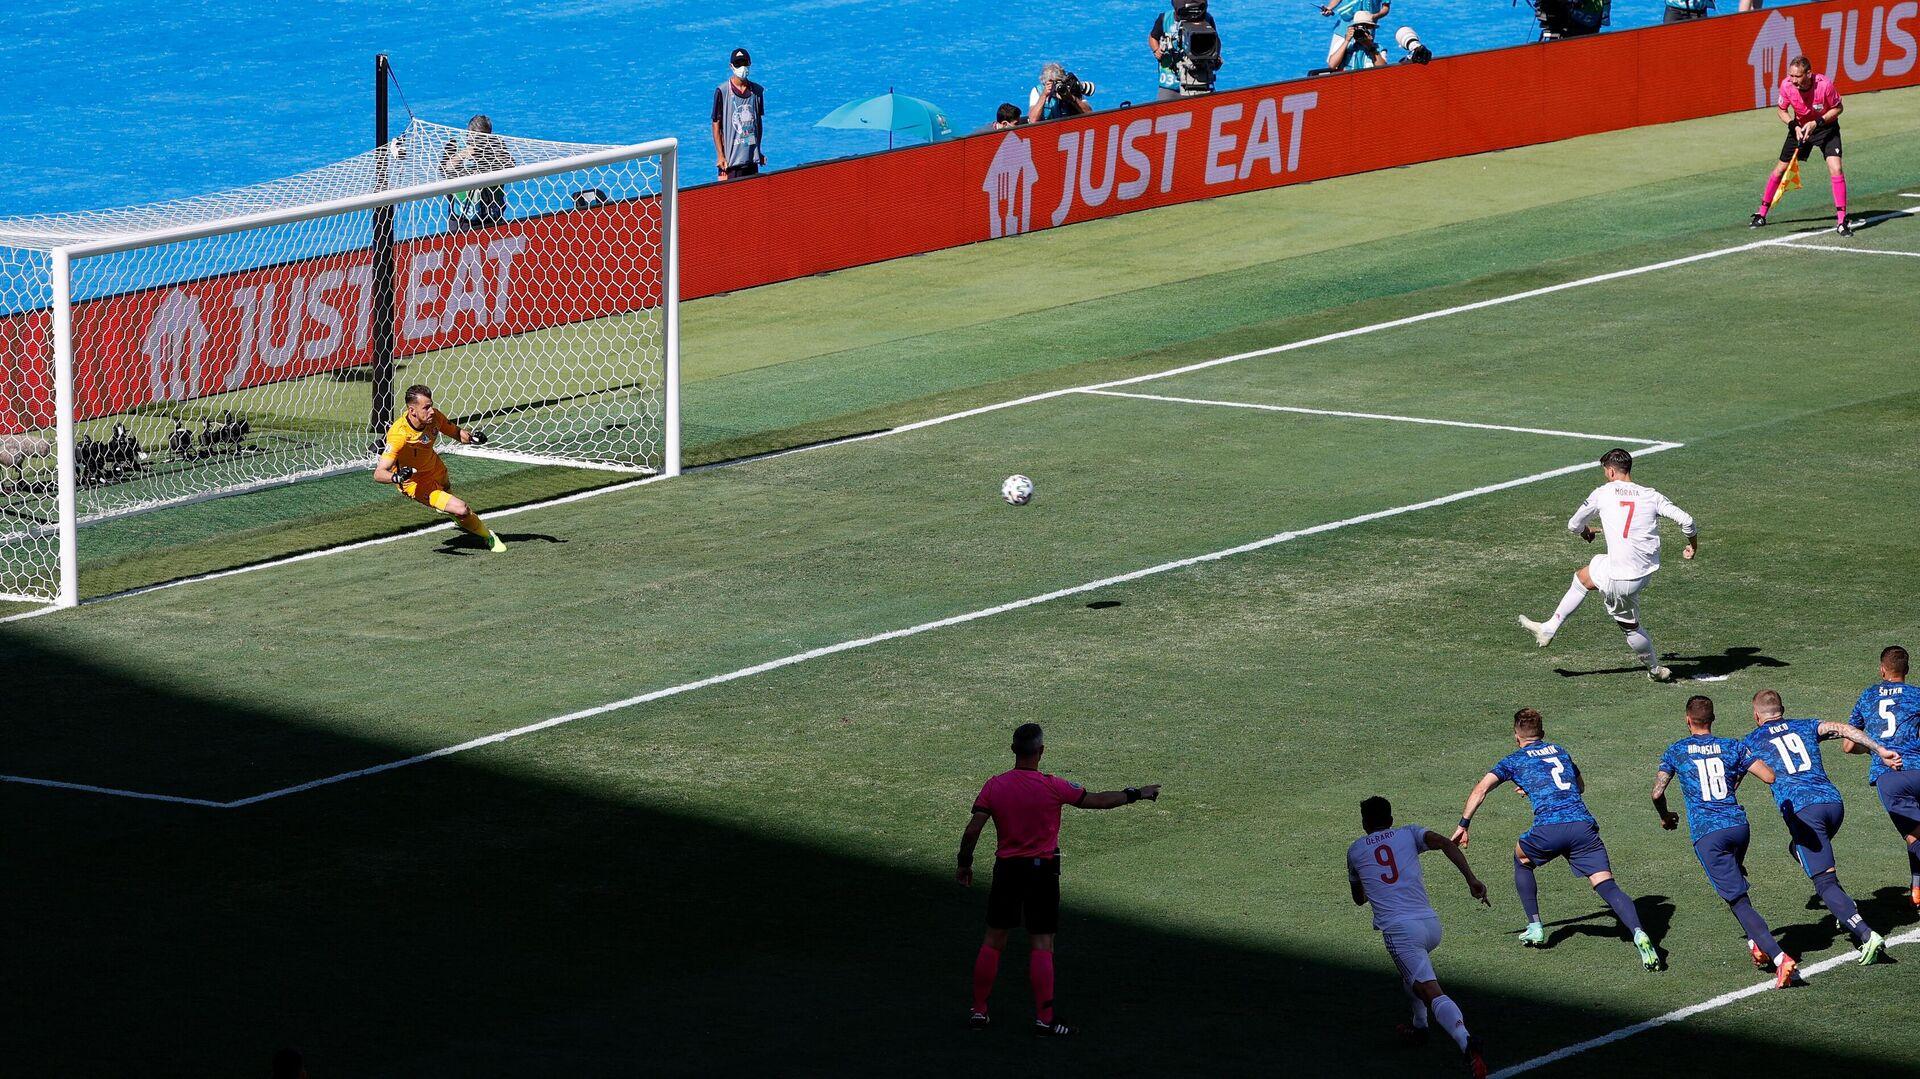 Momento en que el jugador español Álvaro Morata tira un penalti contra Eslovaquia - Sputnik Mundo, 1920, 24.06.2021